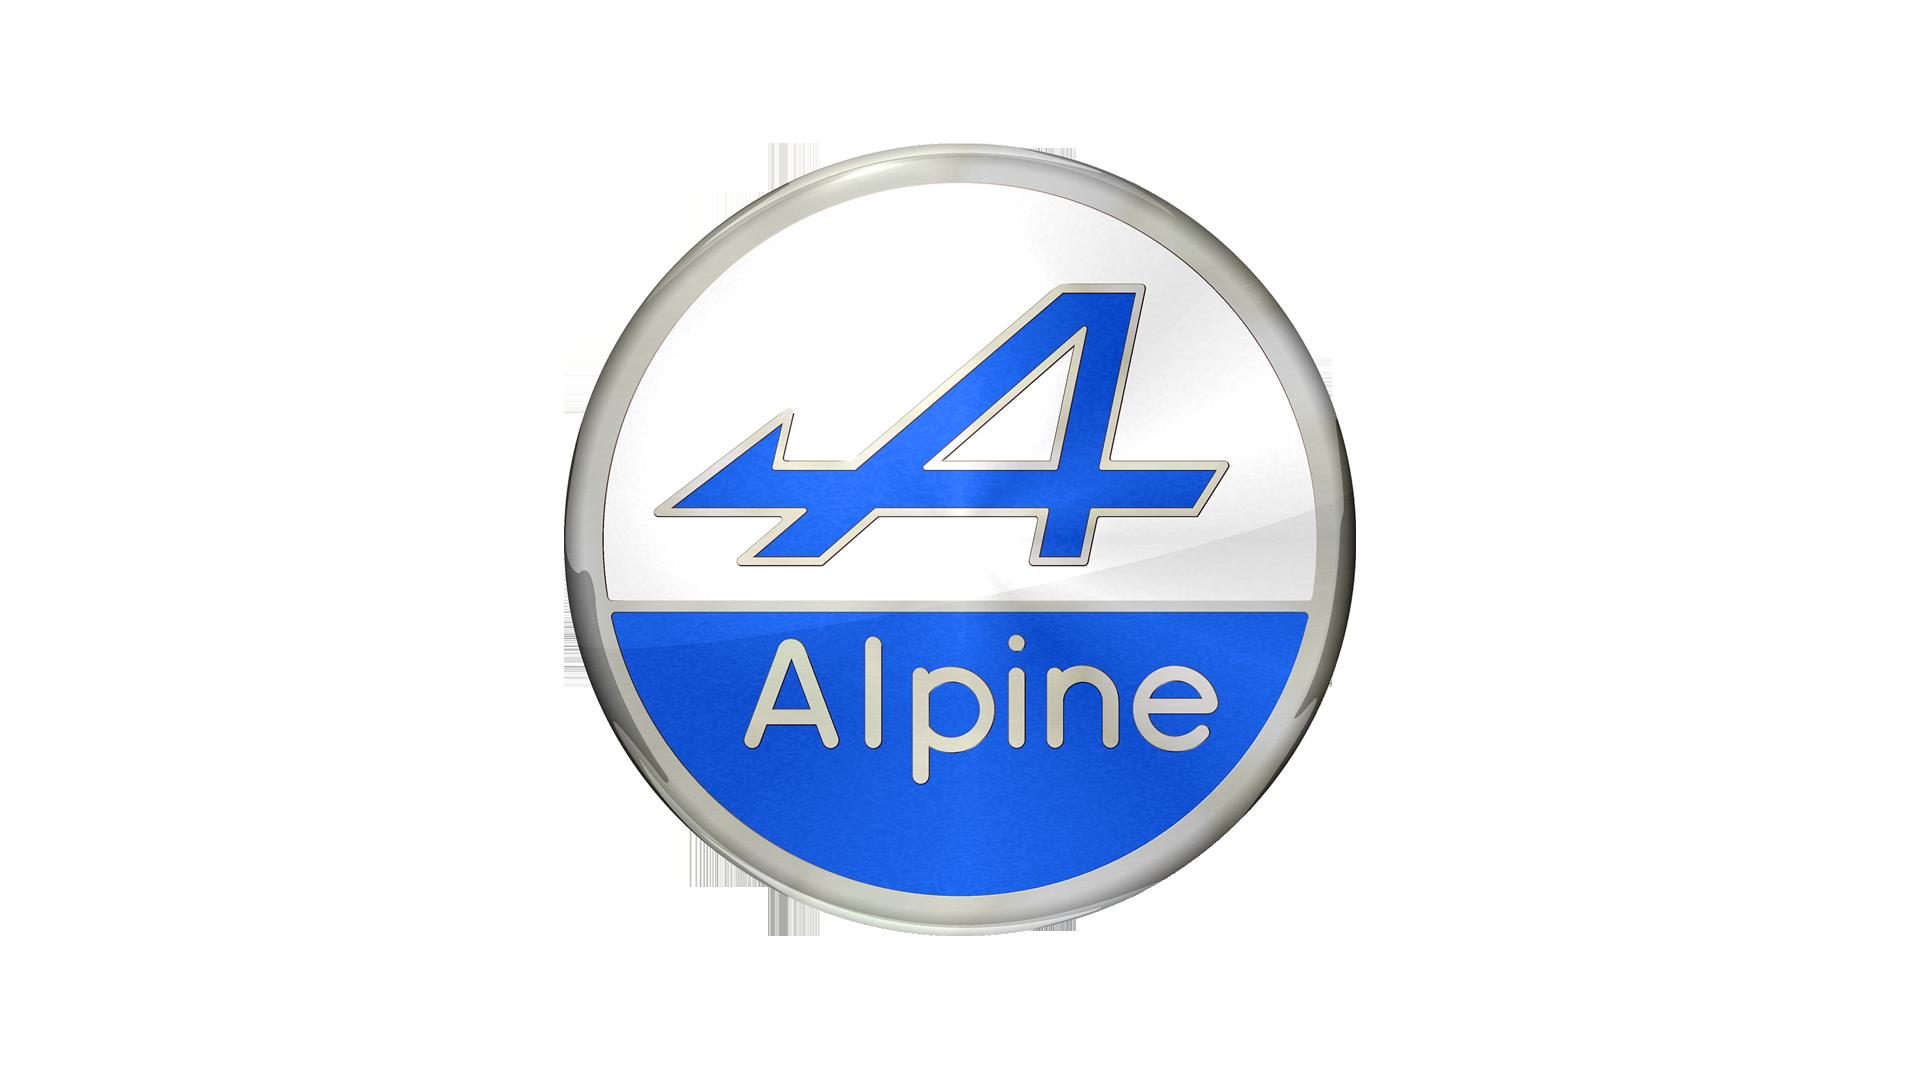 Alpine Automobile Logo Alpine Logo HD Png Information - Car sign with namescar logos and names cars pinterest car logos cars and